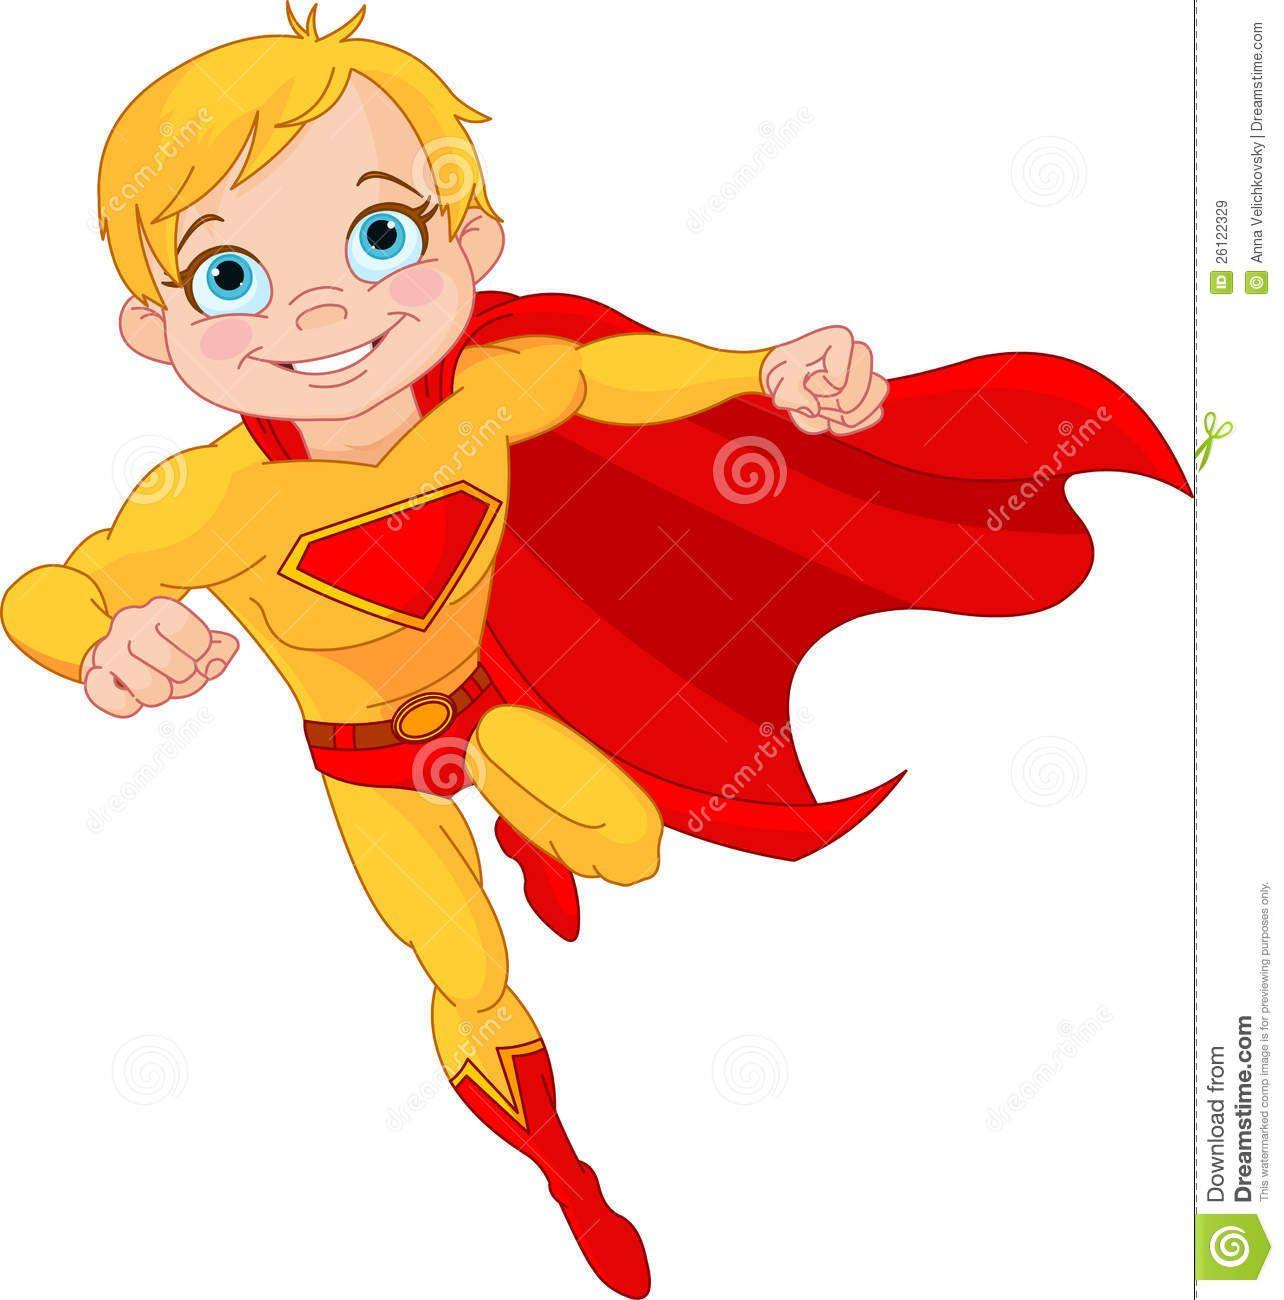 Kid Cartoon Superheroes Google Search Superhero Cartoon Drawing Superheroes Old School Cartoons